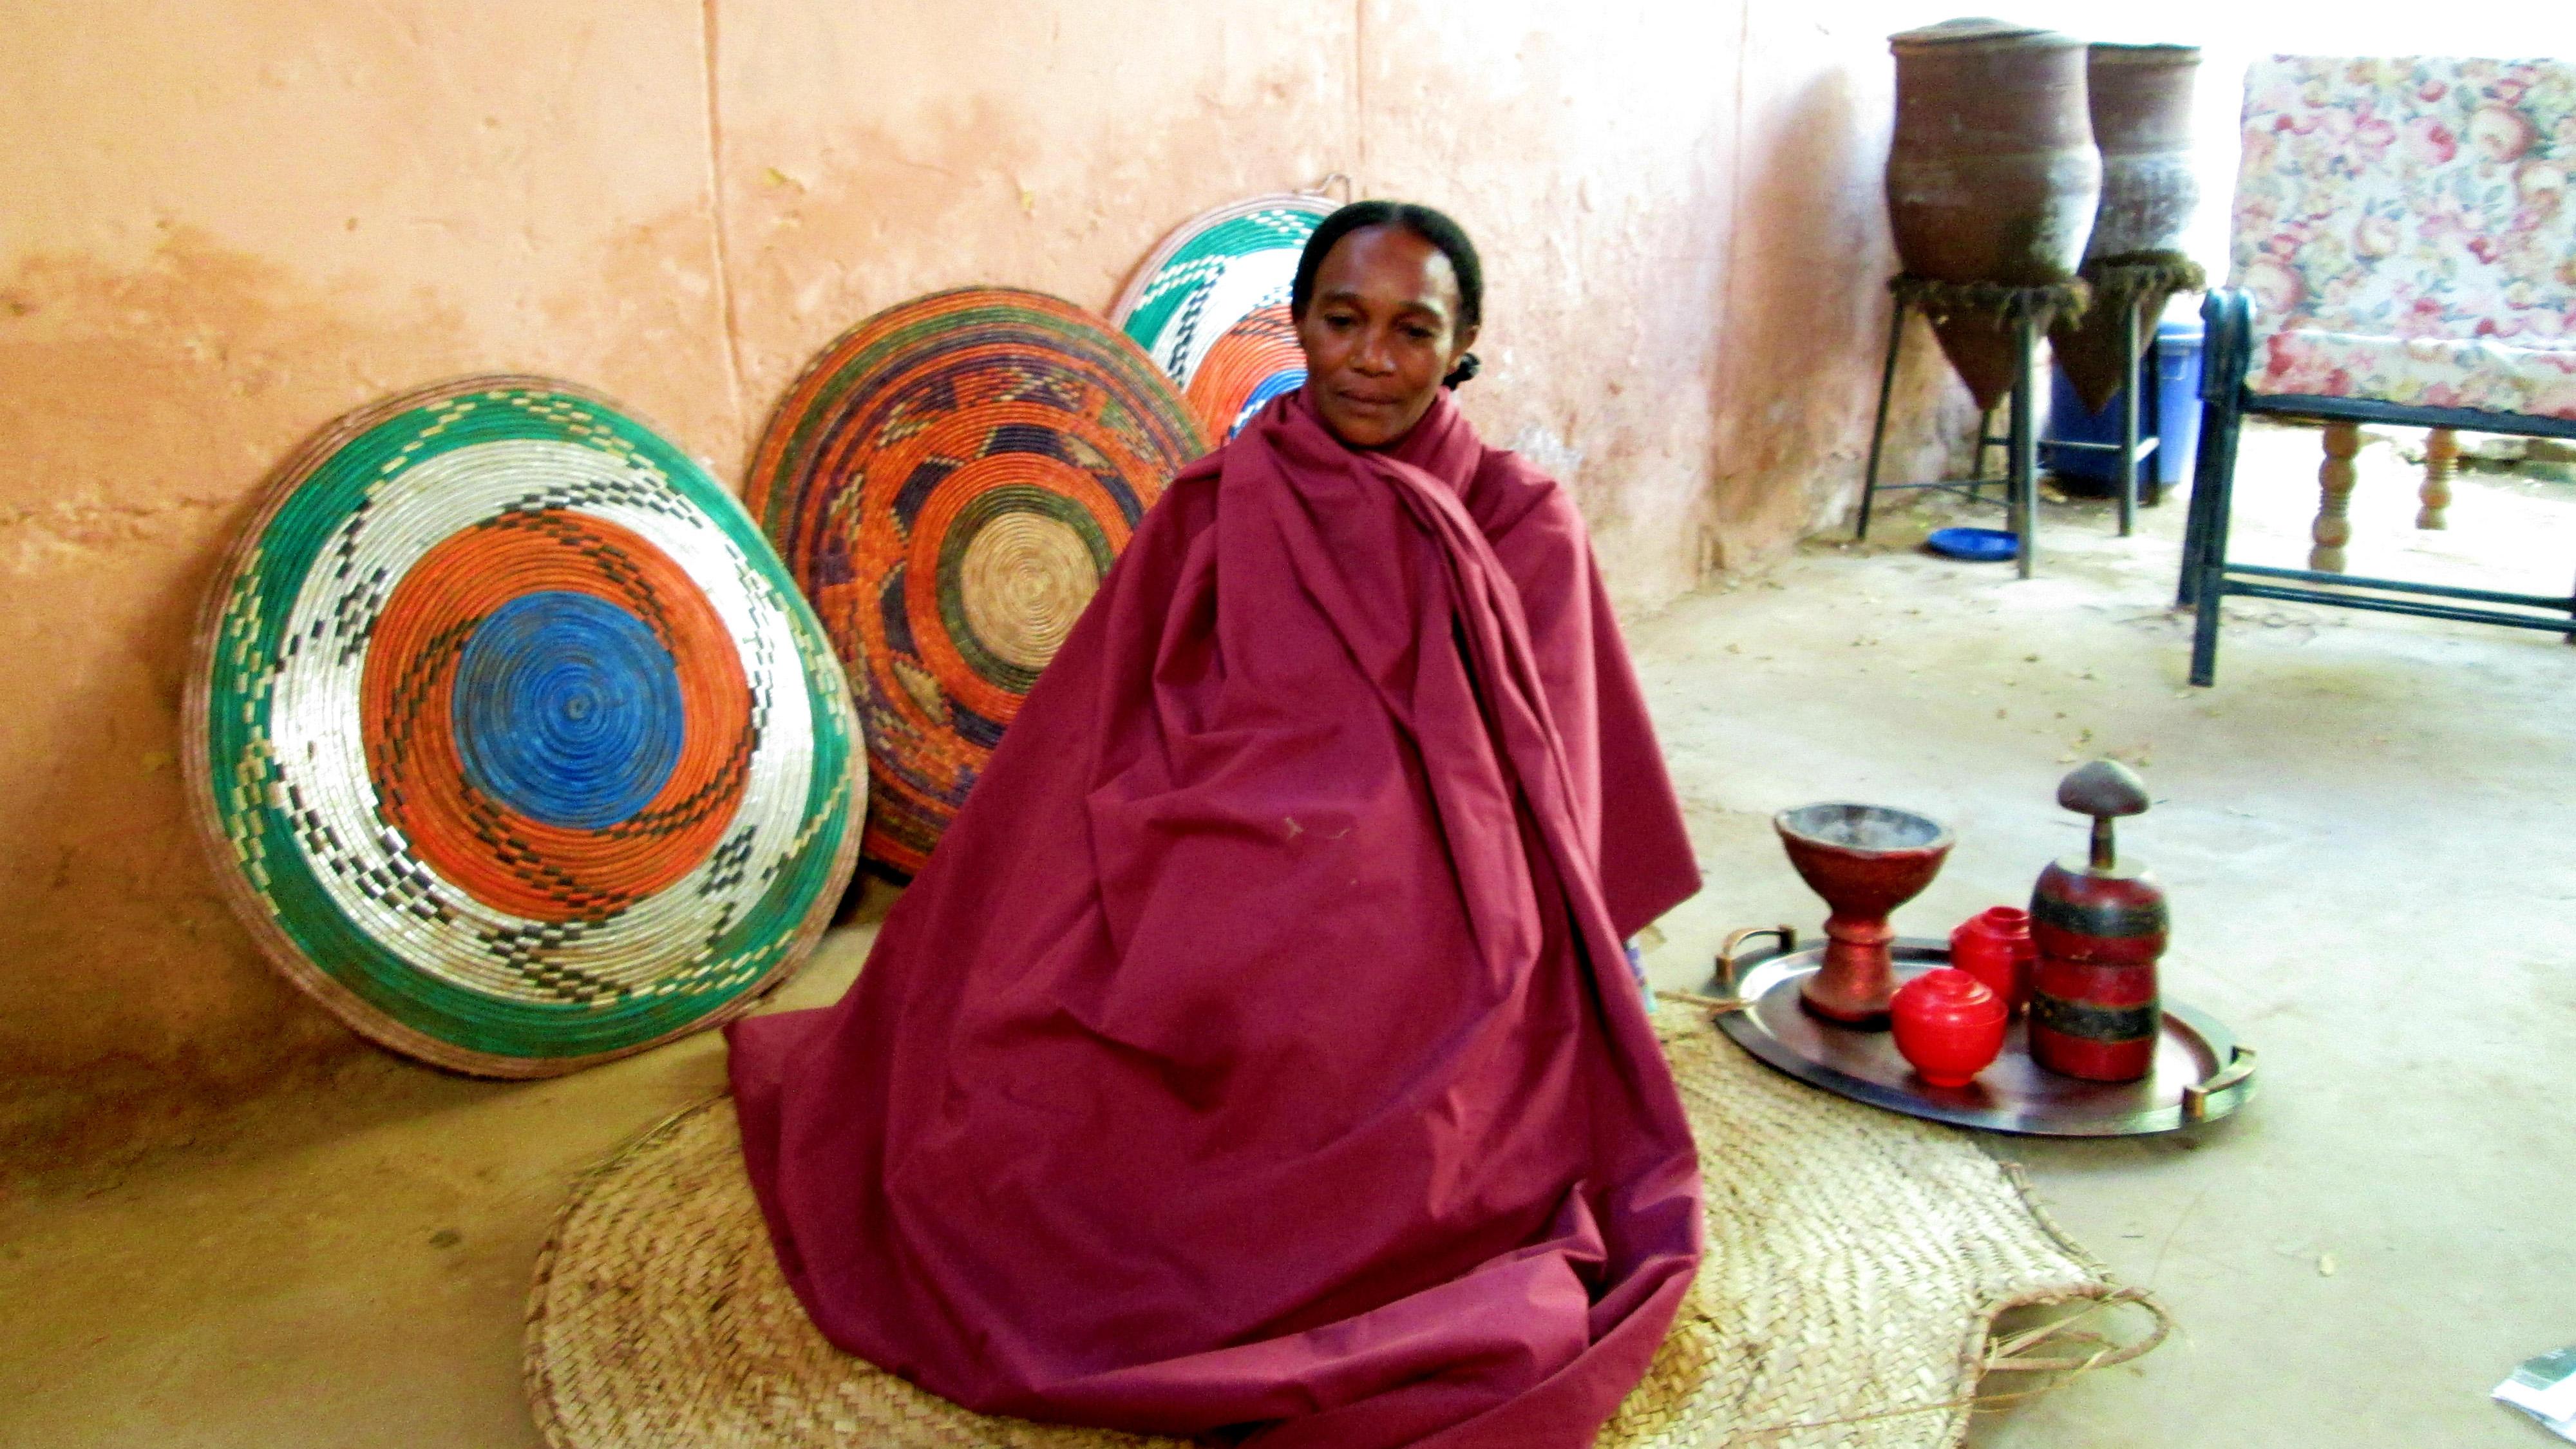 Sudanese wedding rituals and traditions - Dukhaninsudan1 Copy Jpg